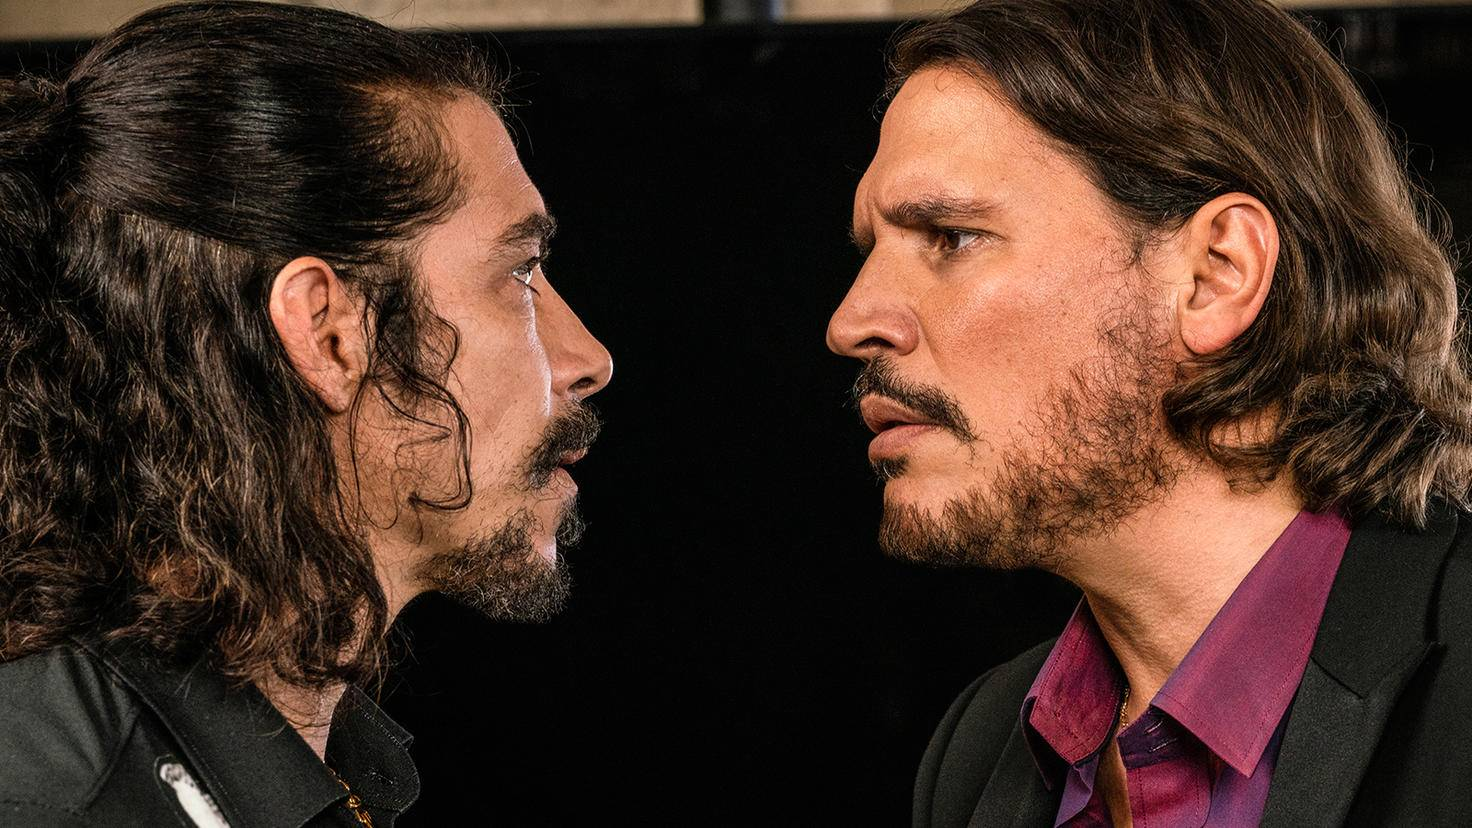 Rambo 5-Oscar Jaenada als Victor Martinez-Sergio Peris Mencheta als Hugo Martinez-Yana Blajeva-Lionsgate